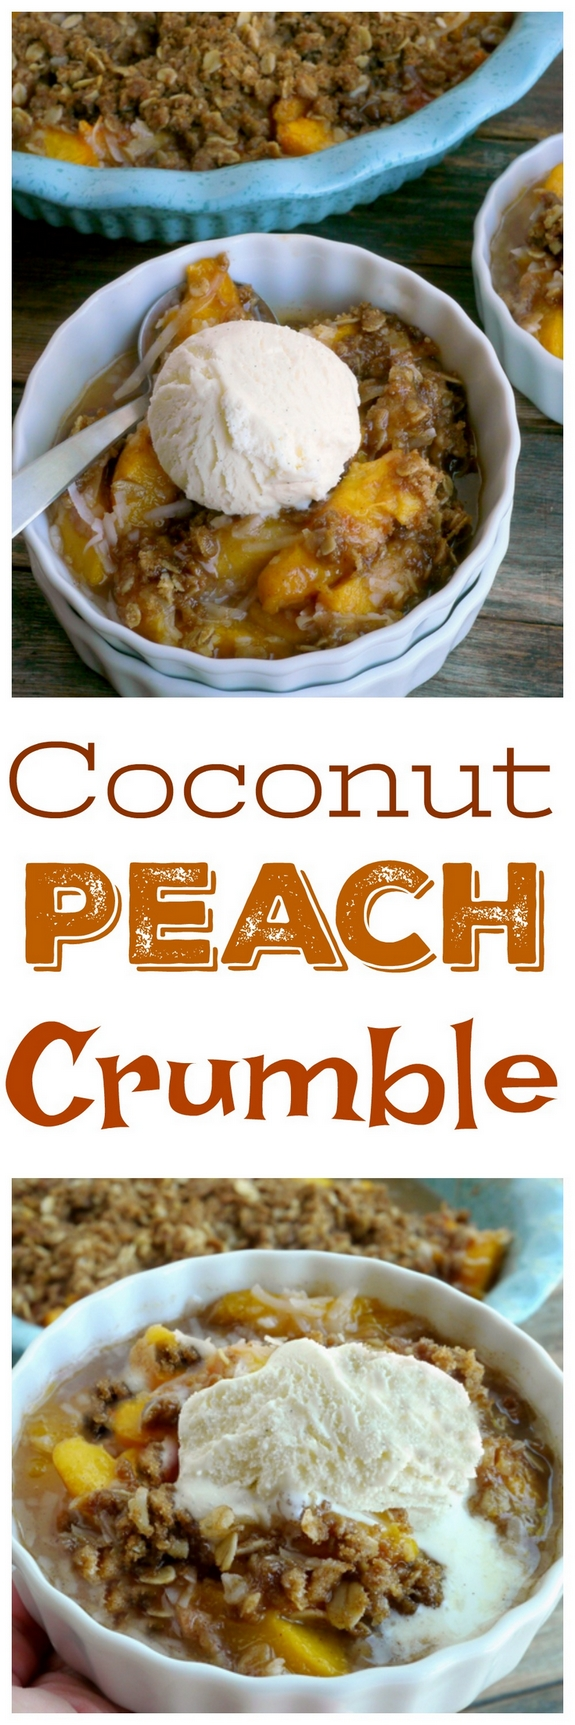 Coconut Peach Crumble